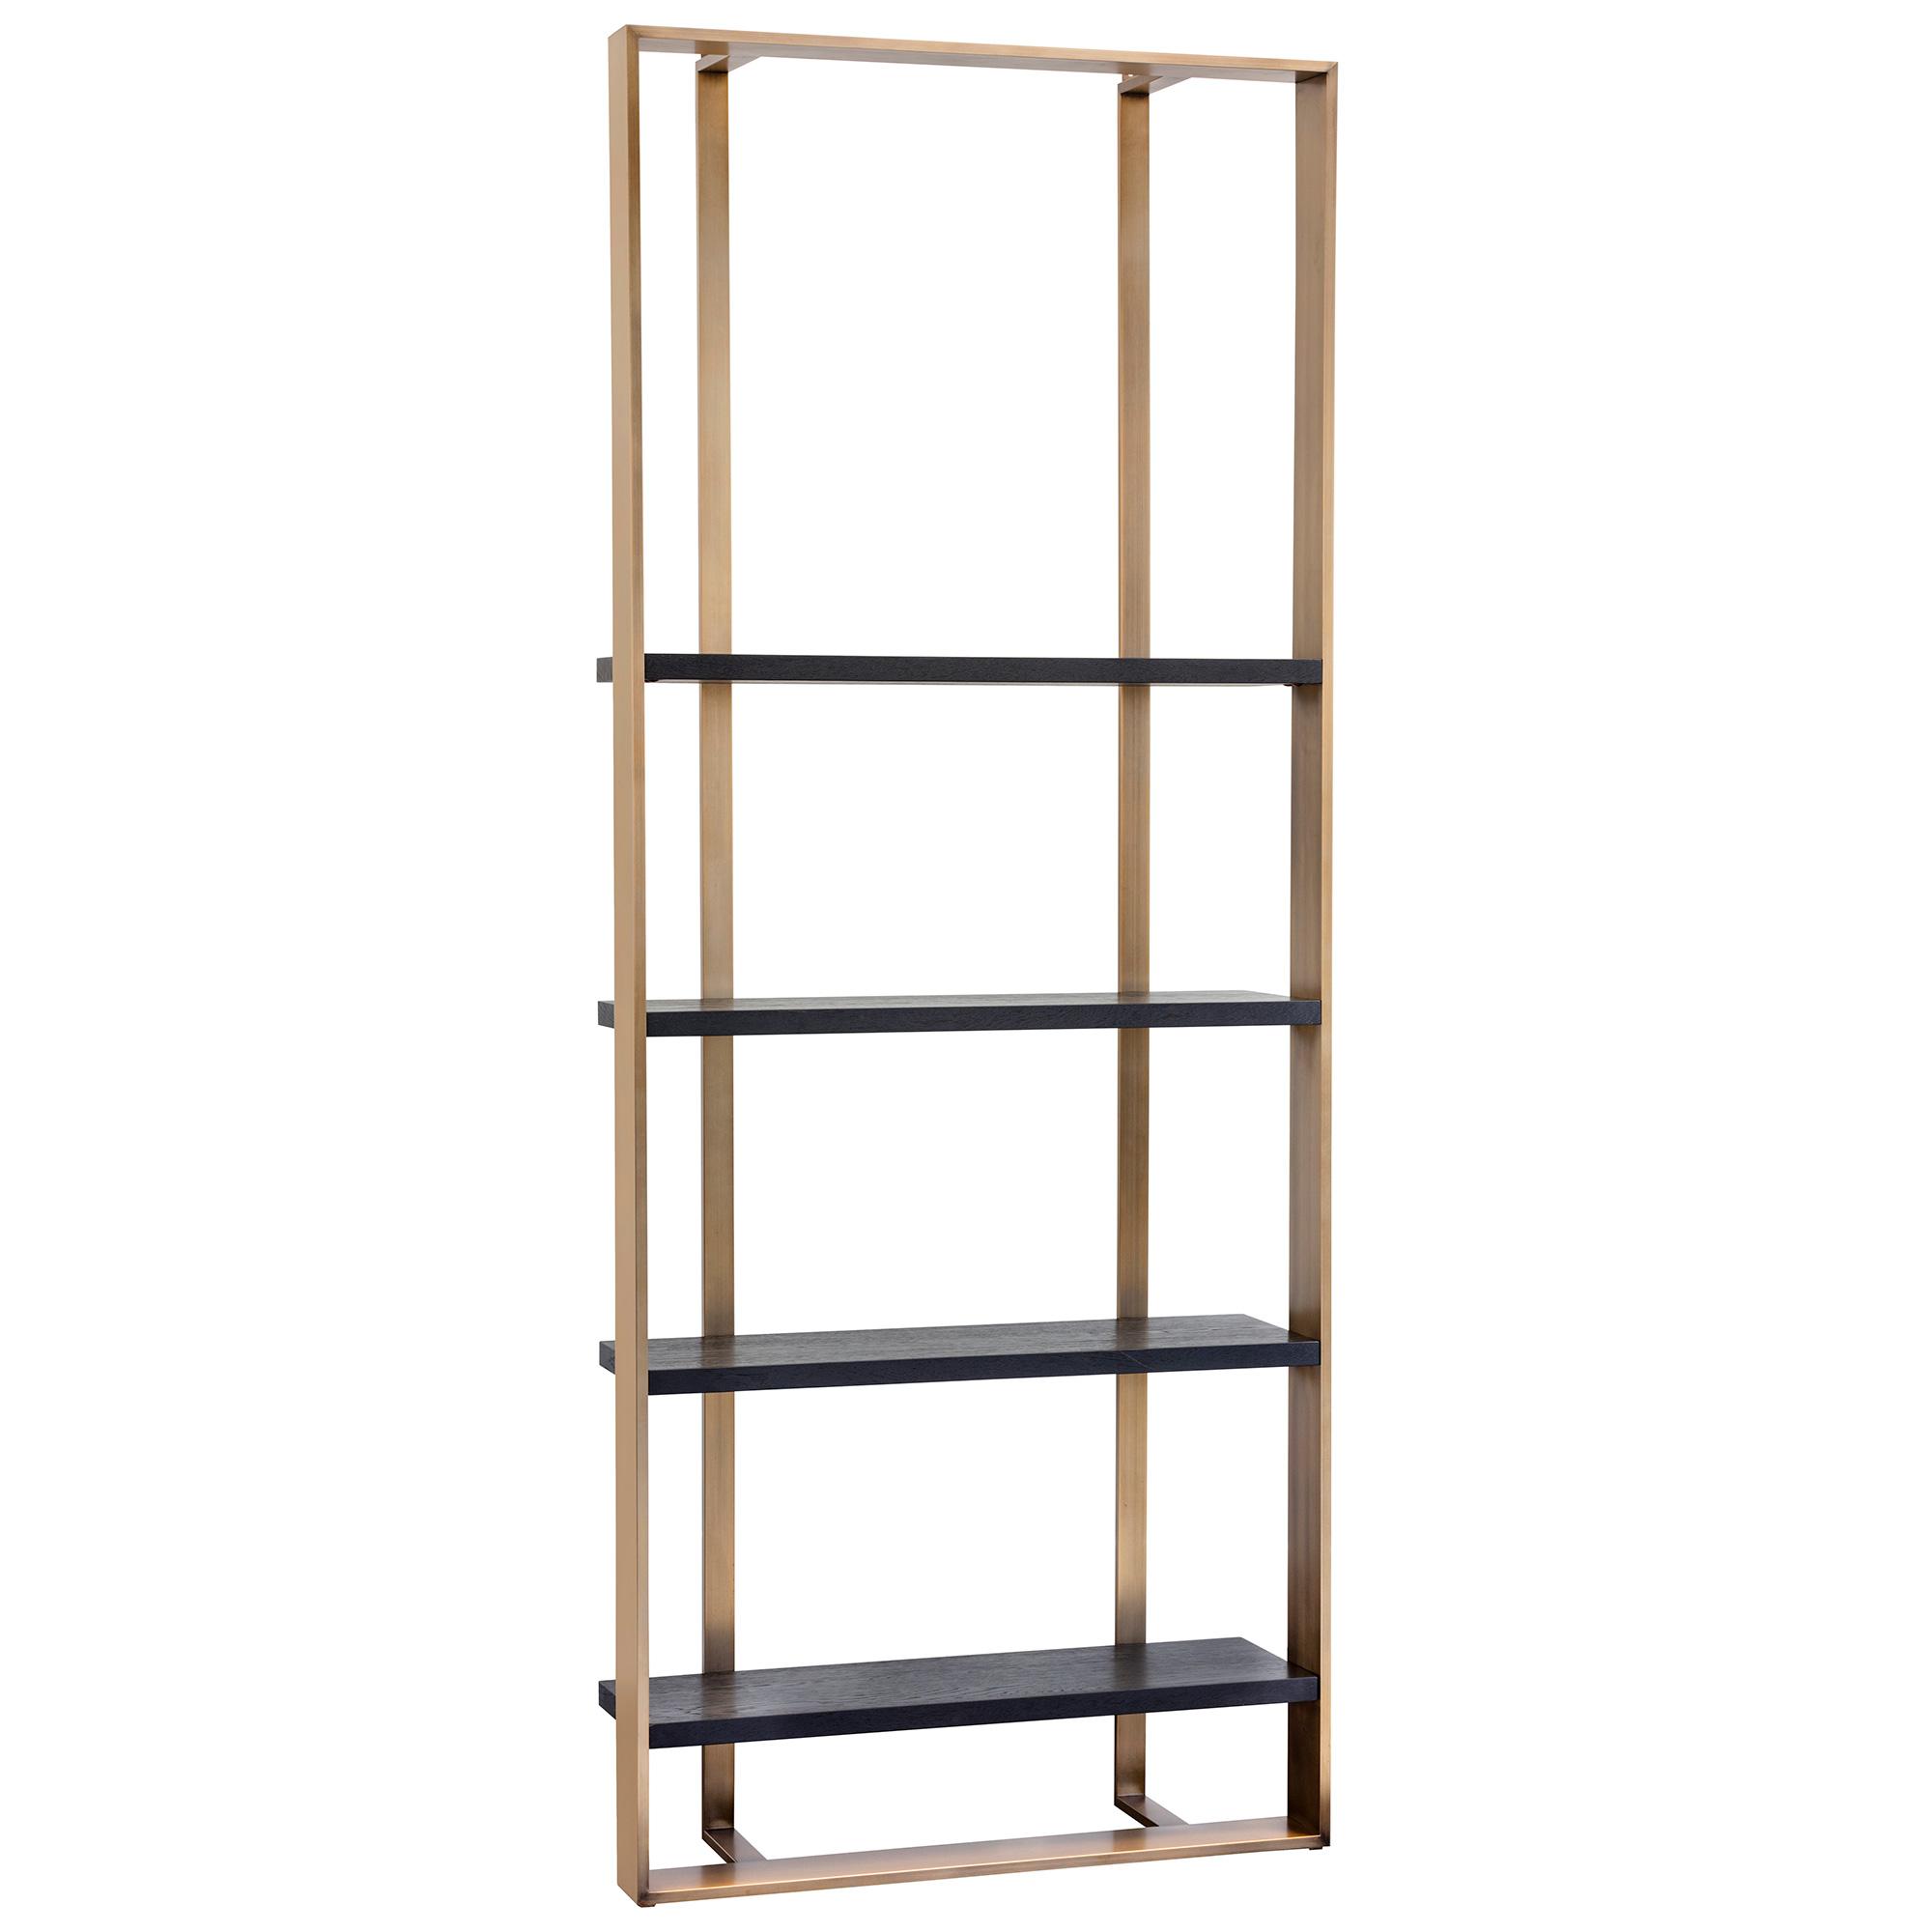 Dalton Bookcase In Antique Brass Frame W Black Oak Shelves By Sunpan